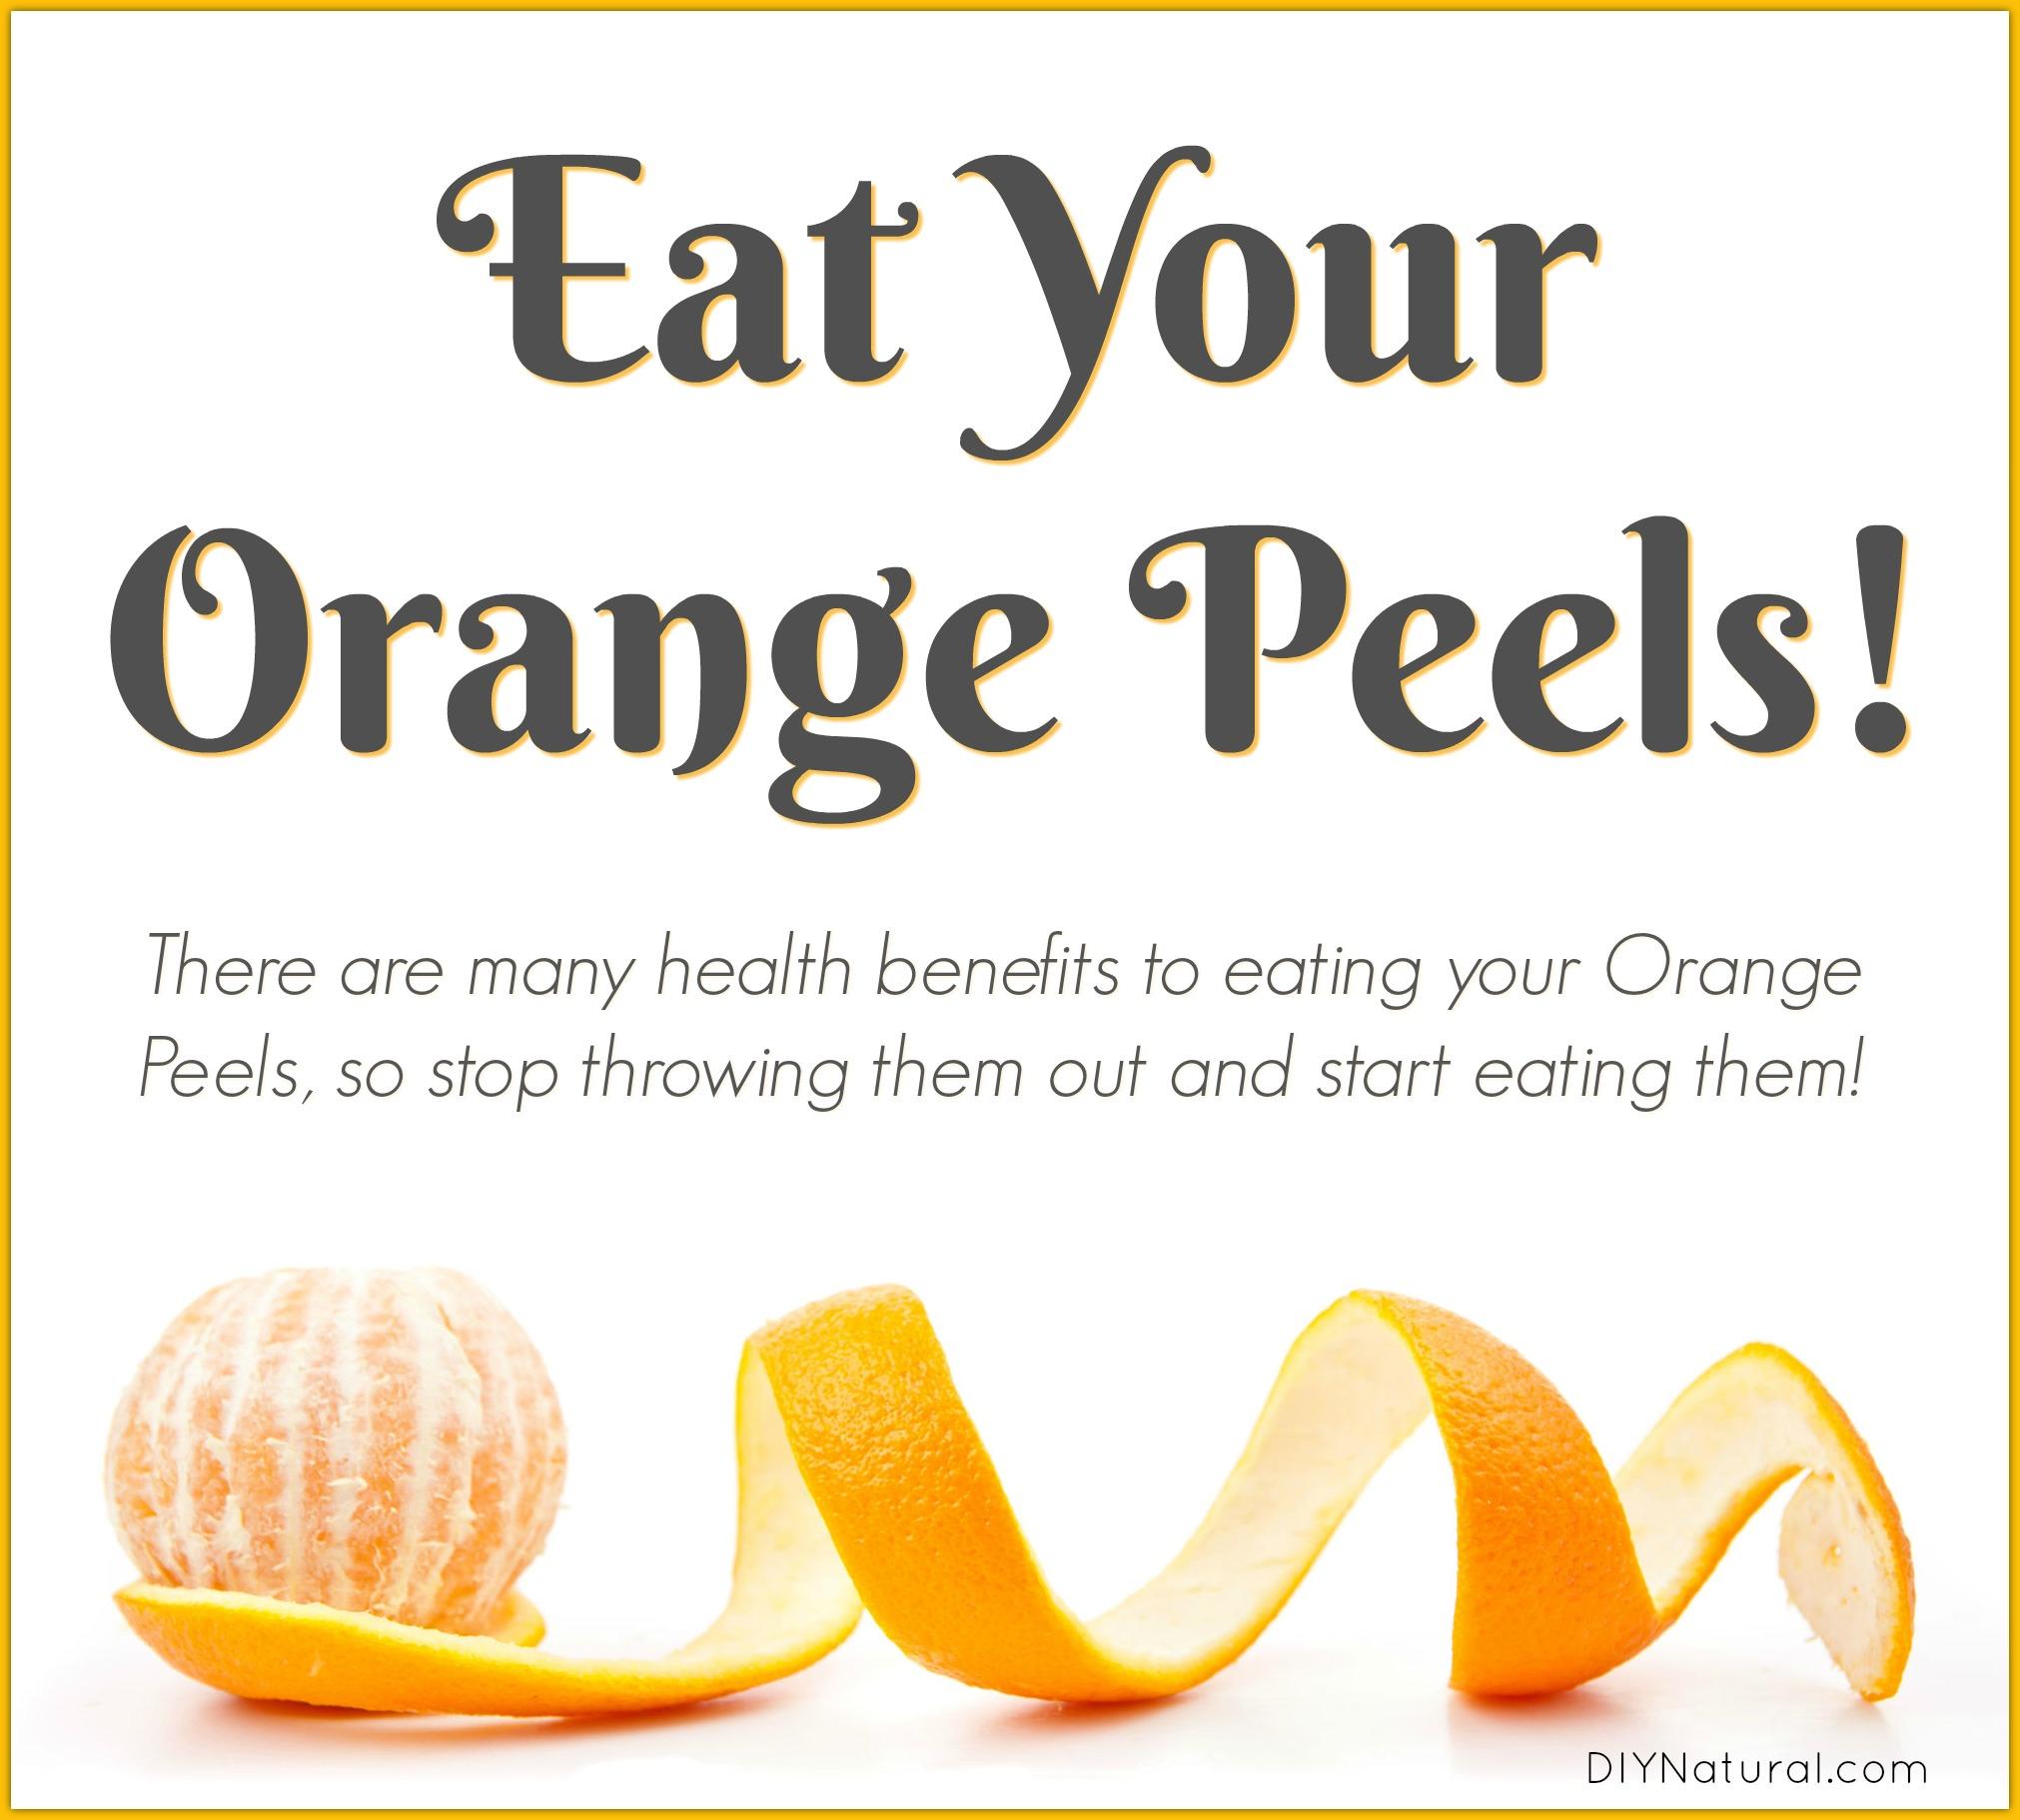 orange peel benefits and why you should be eating orange peel